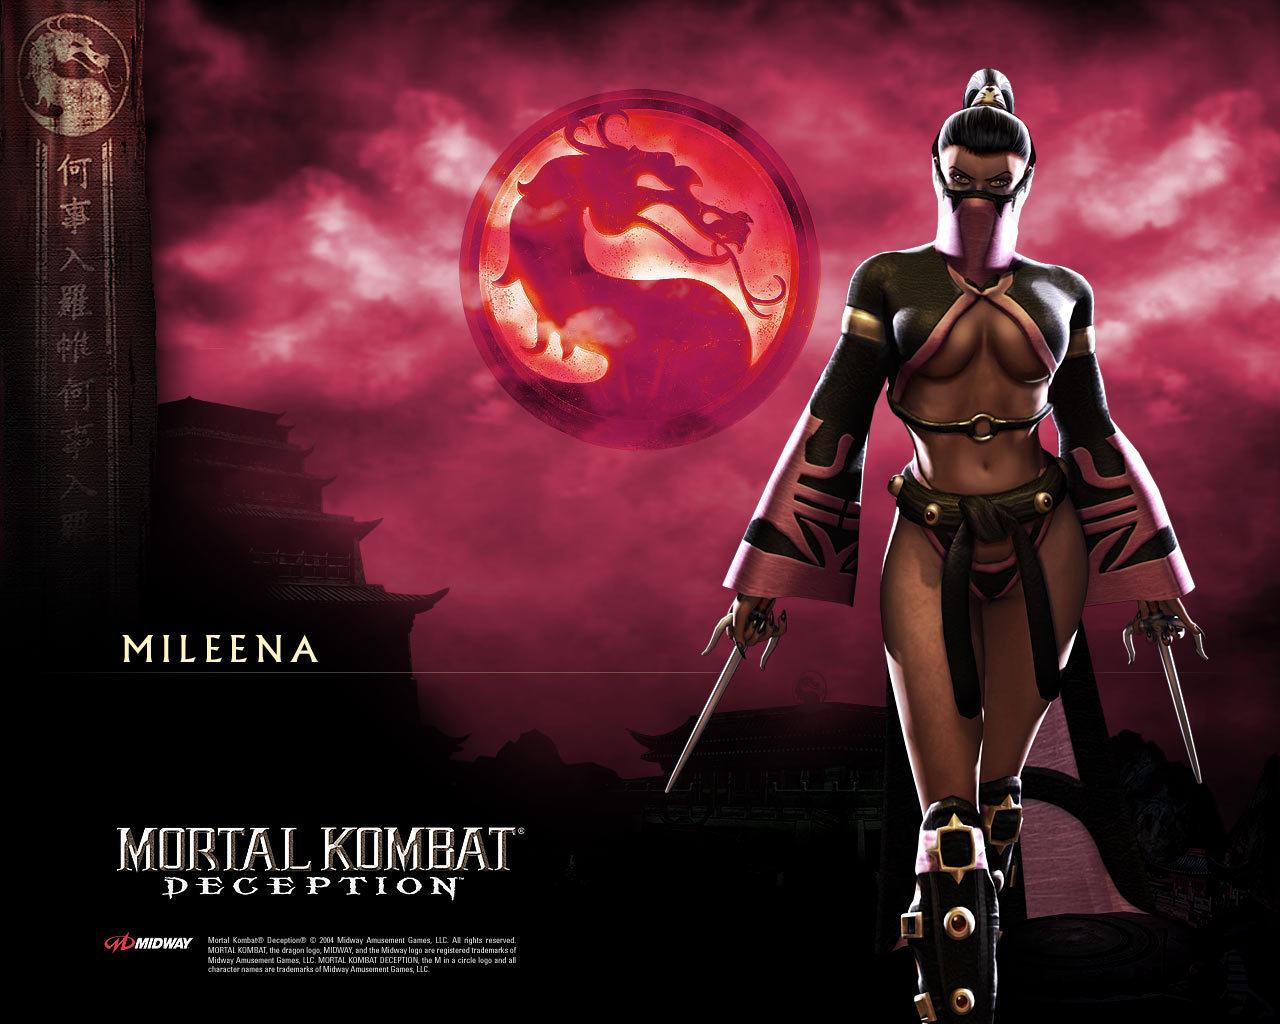 22924 Screensavers and Wallpapers Mortal Kombat for phone. Download Games, Mortal Kombat pictures for free